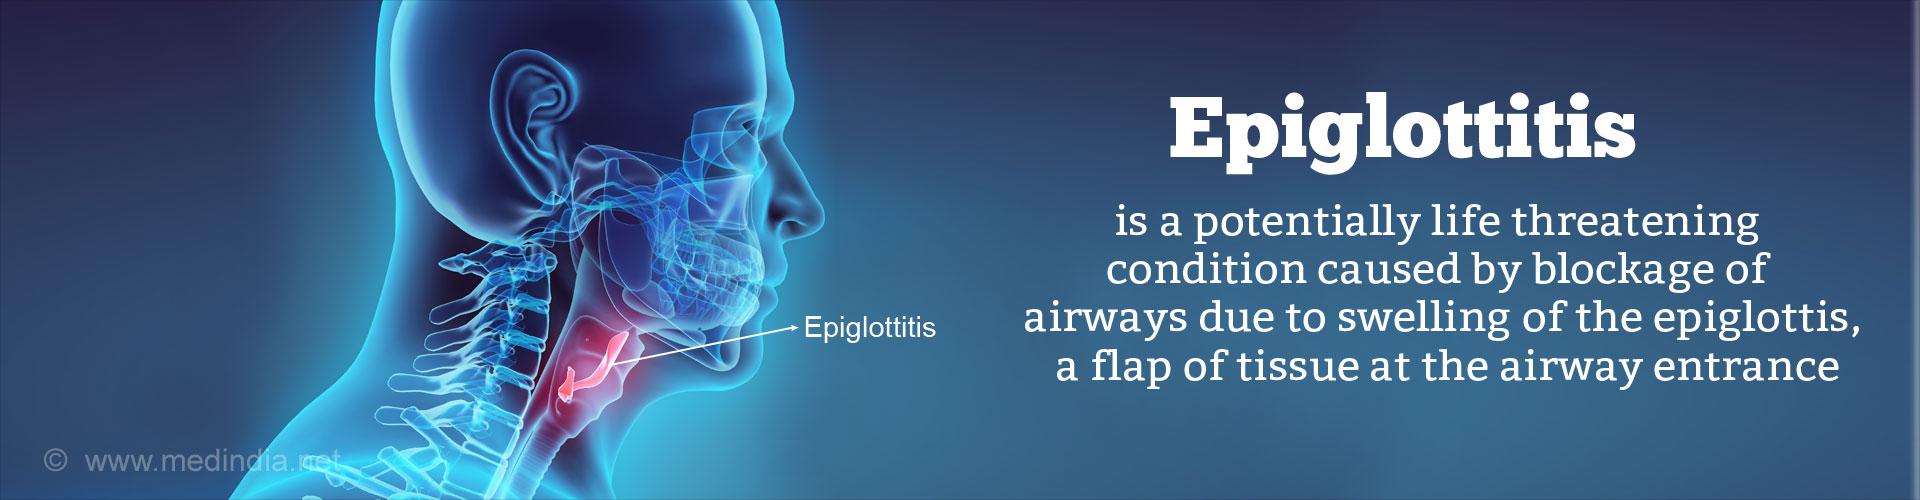 Epiglottitis